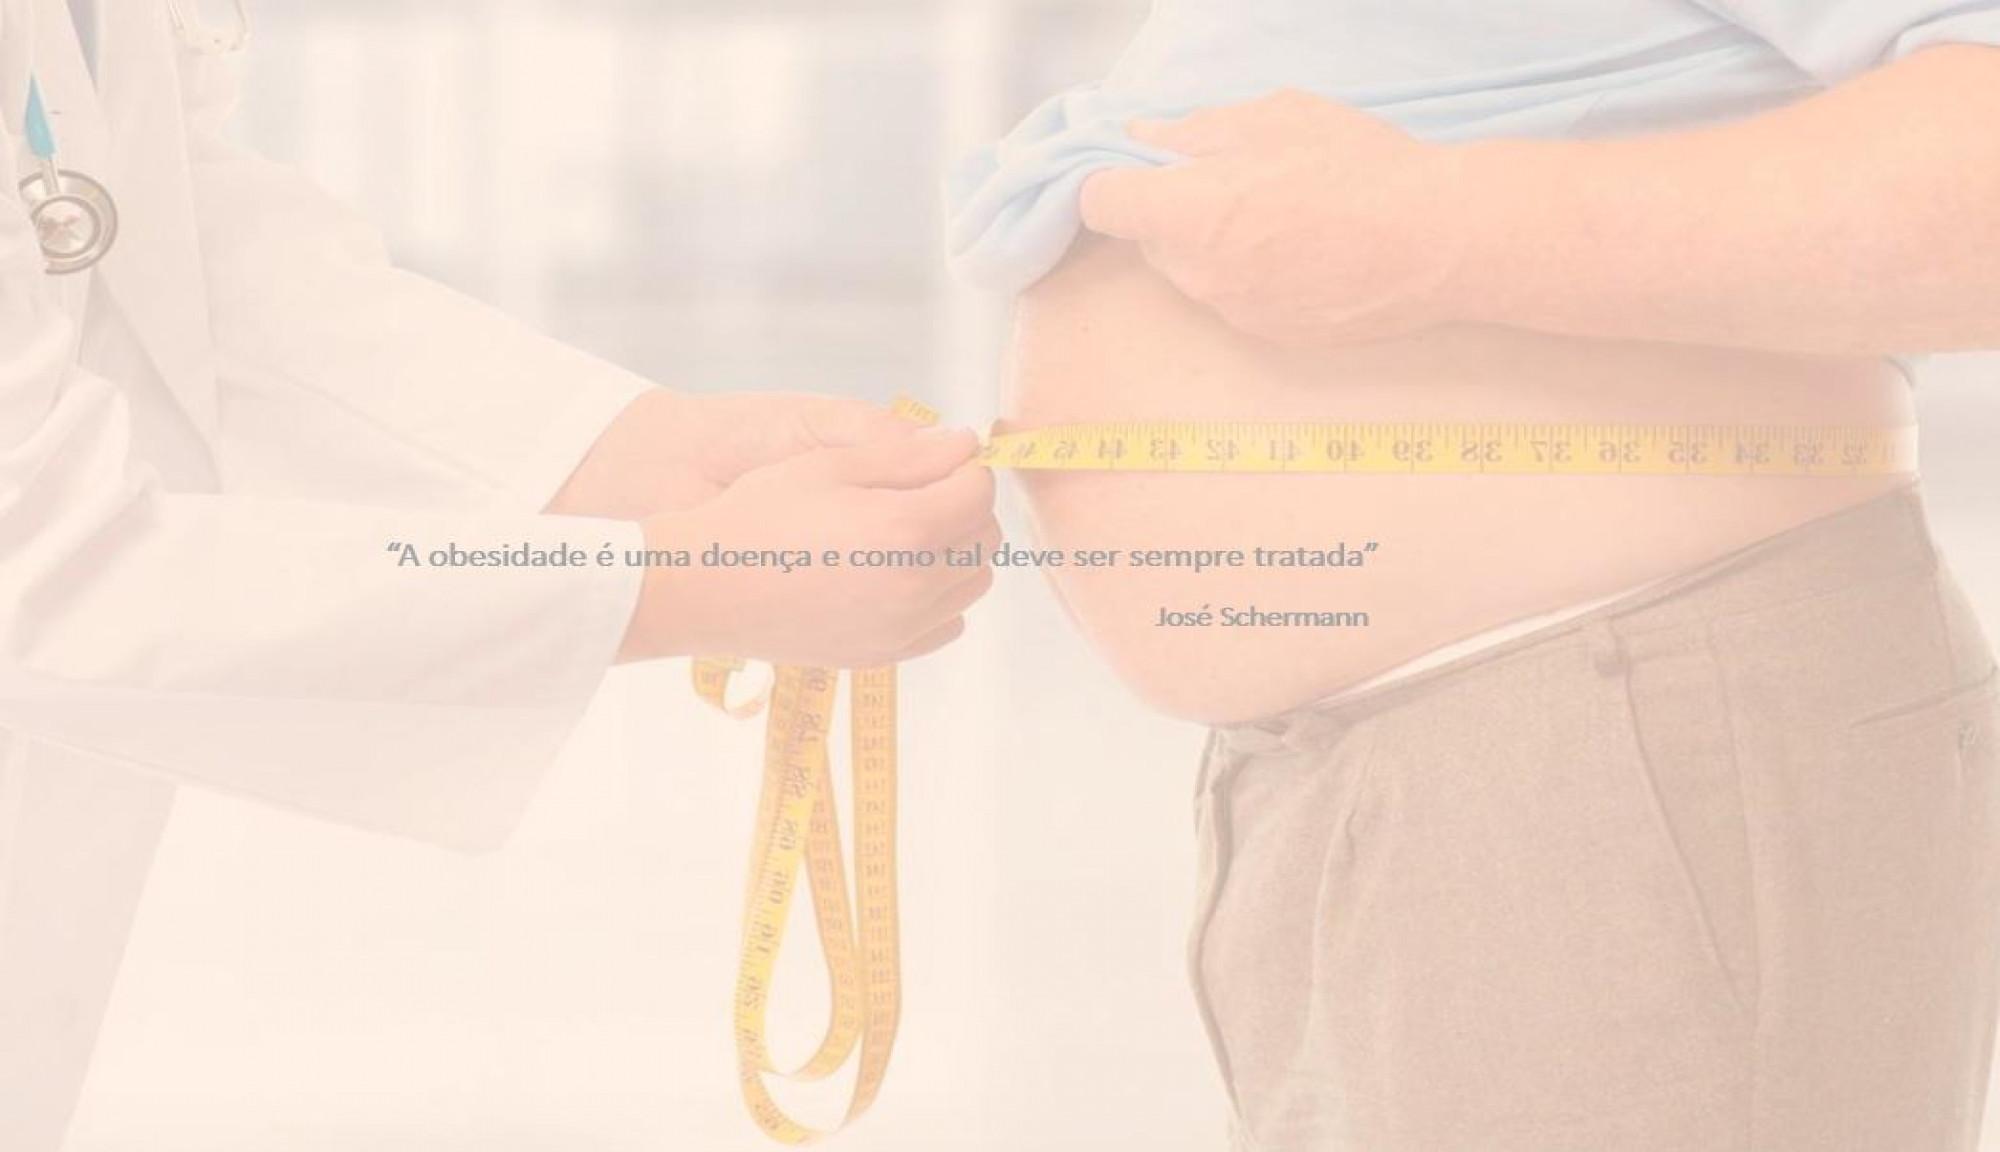 r_Jose_Scherman_obesidade